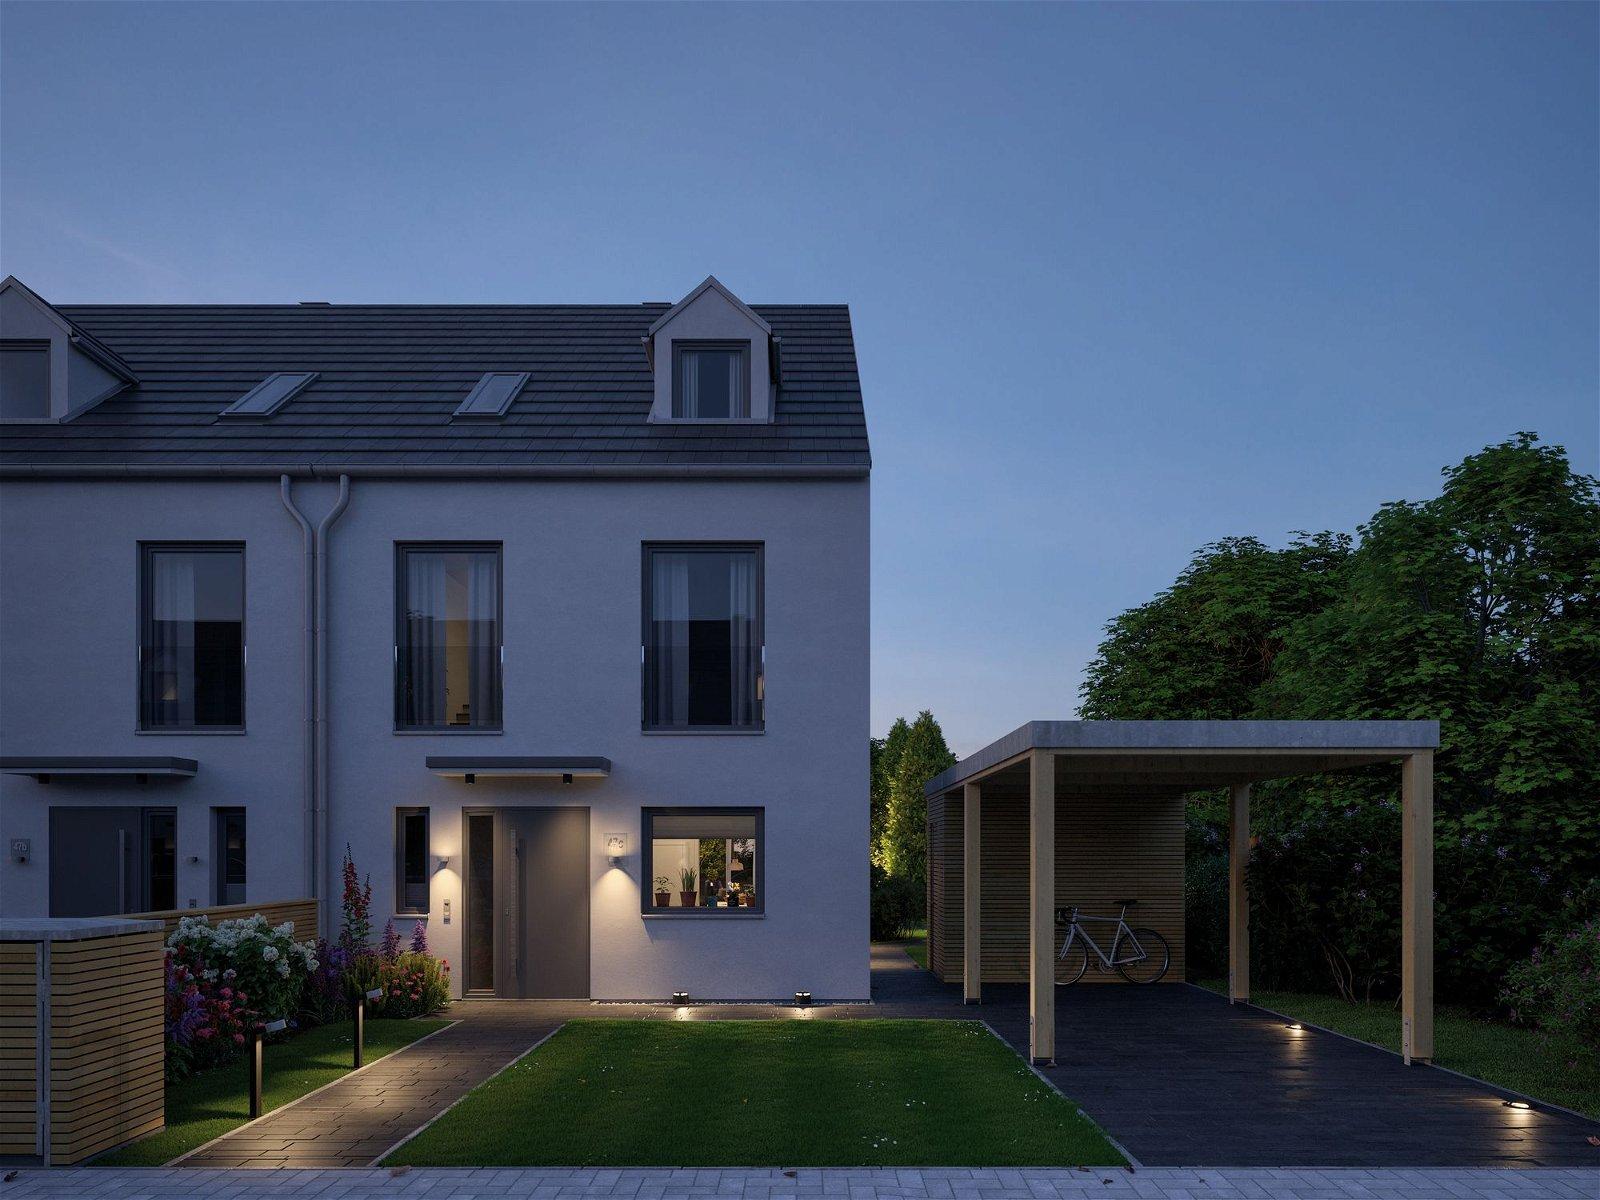 House Applique d'extérieur LED IP44 rond 95mm 3000K 4,4W 530lm 230V Anthracite Alu/Acryl